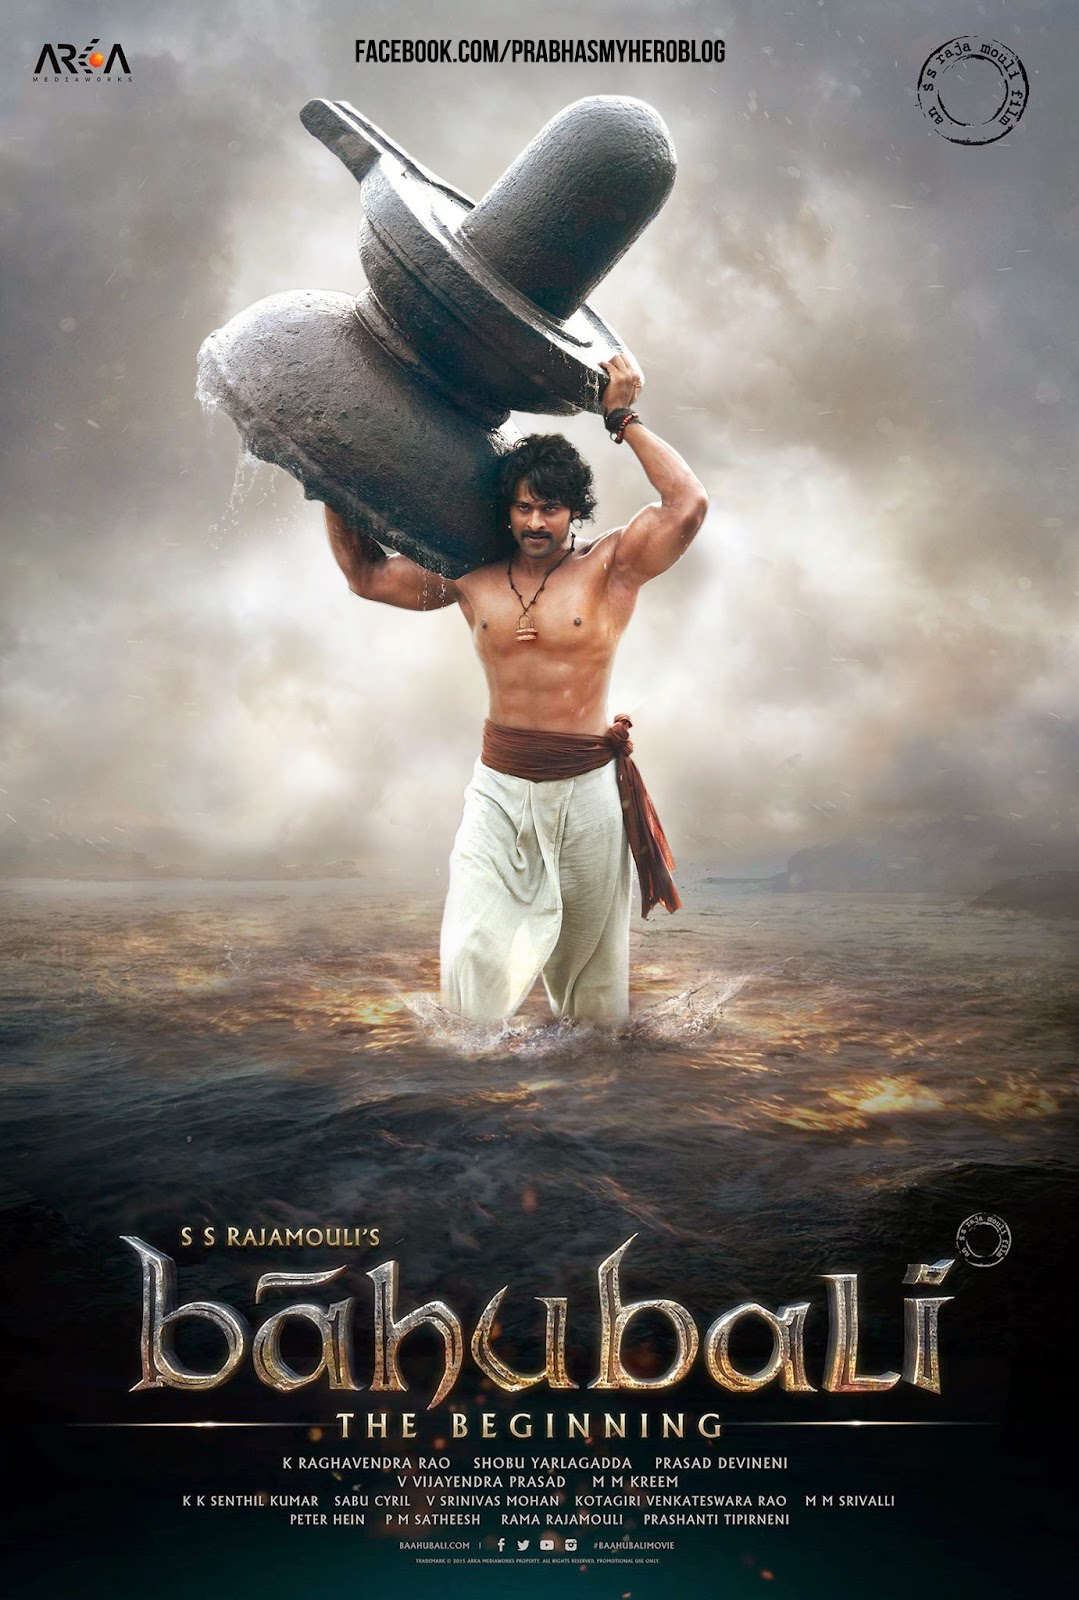 mere paas cine-ma hai!: bahubali- the beginning: the grand